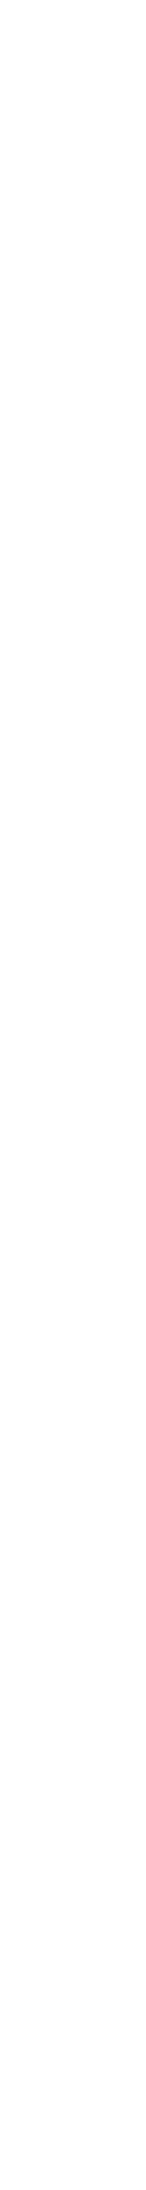 Image-Line-4